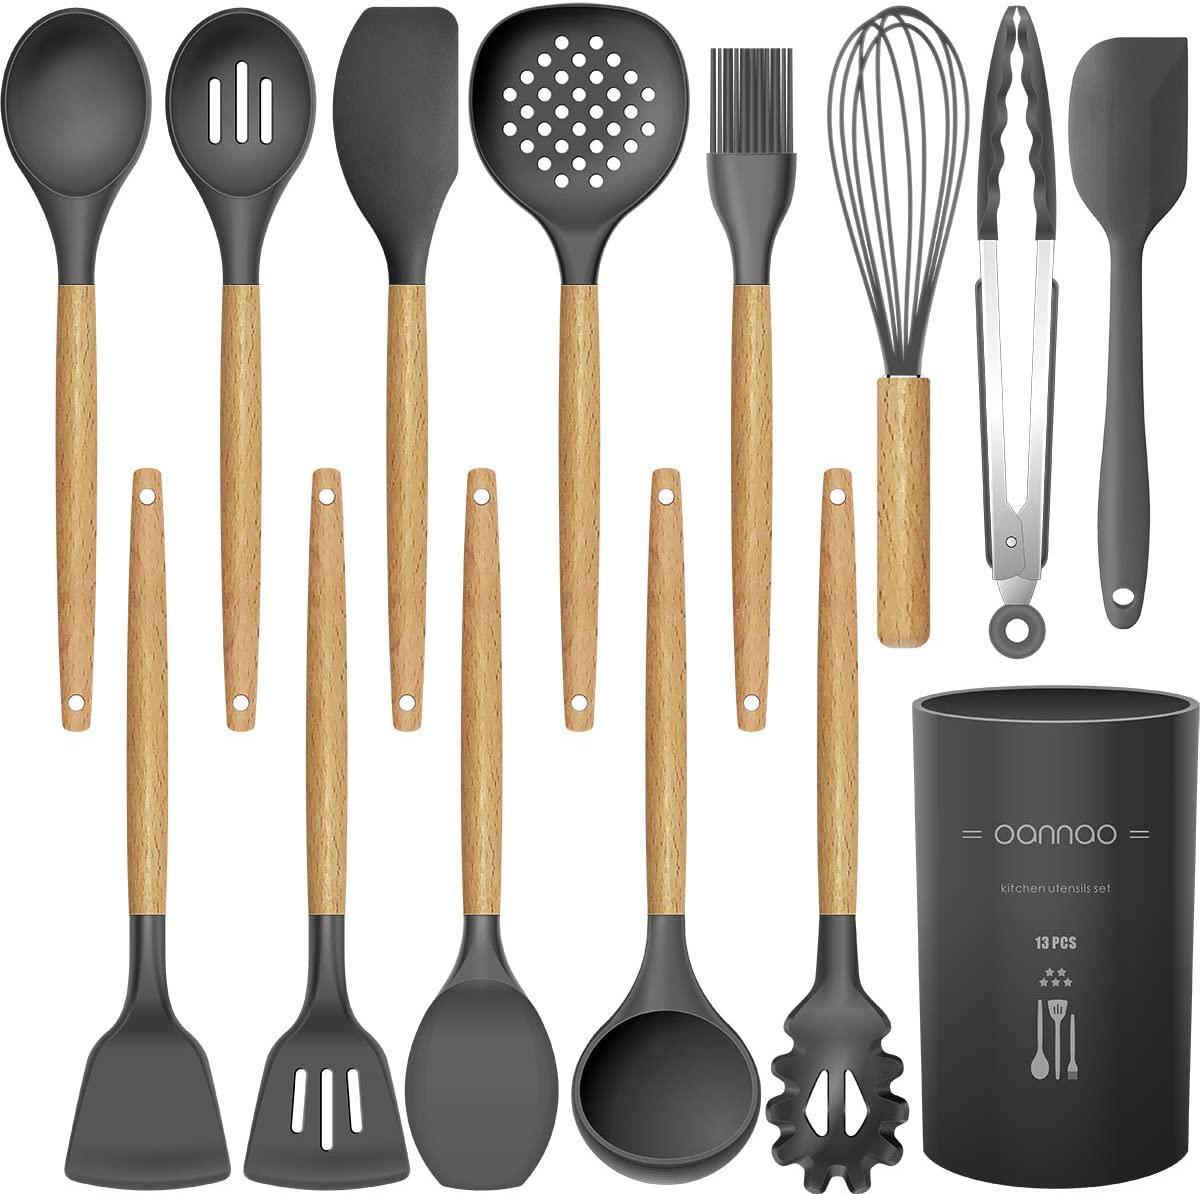 14 Pcs Silicone Cooking Utensils Kitchen Utensil Set - 446°